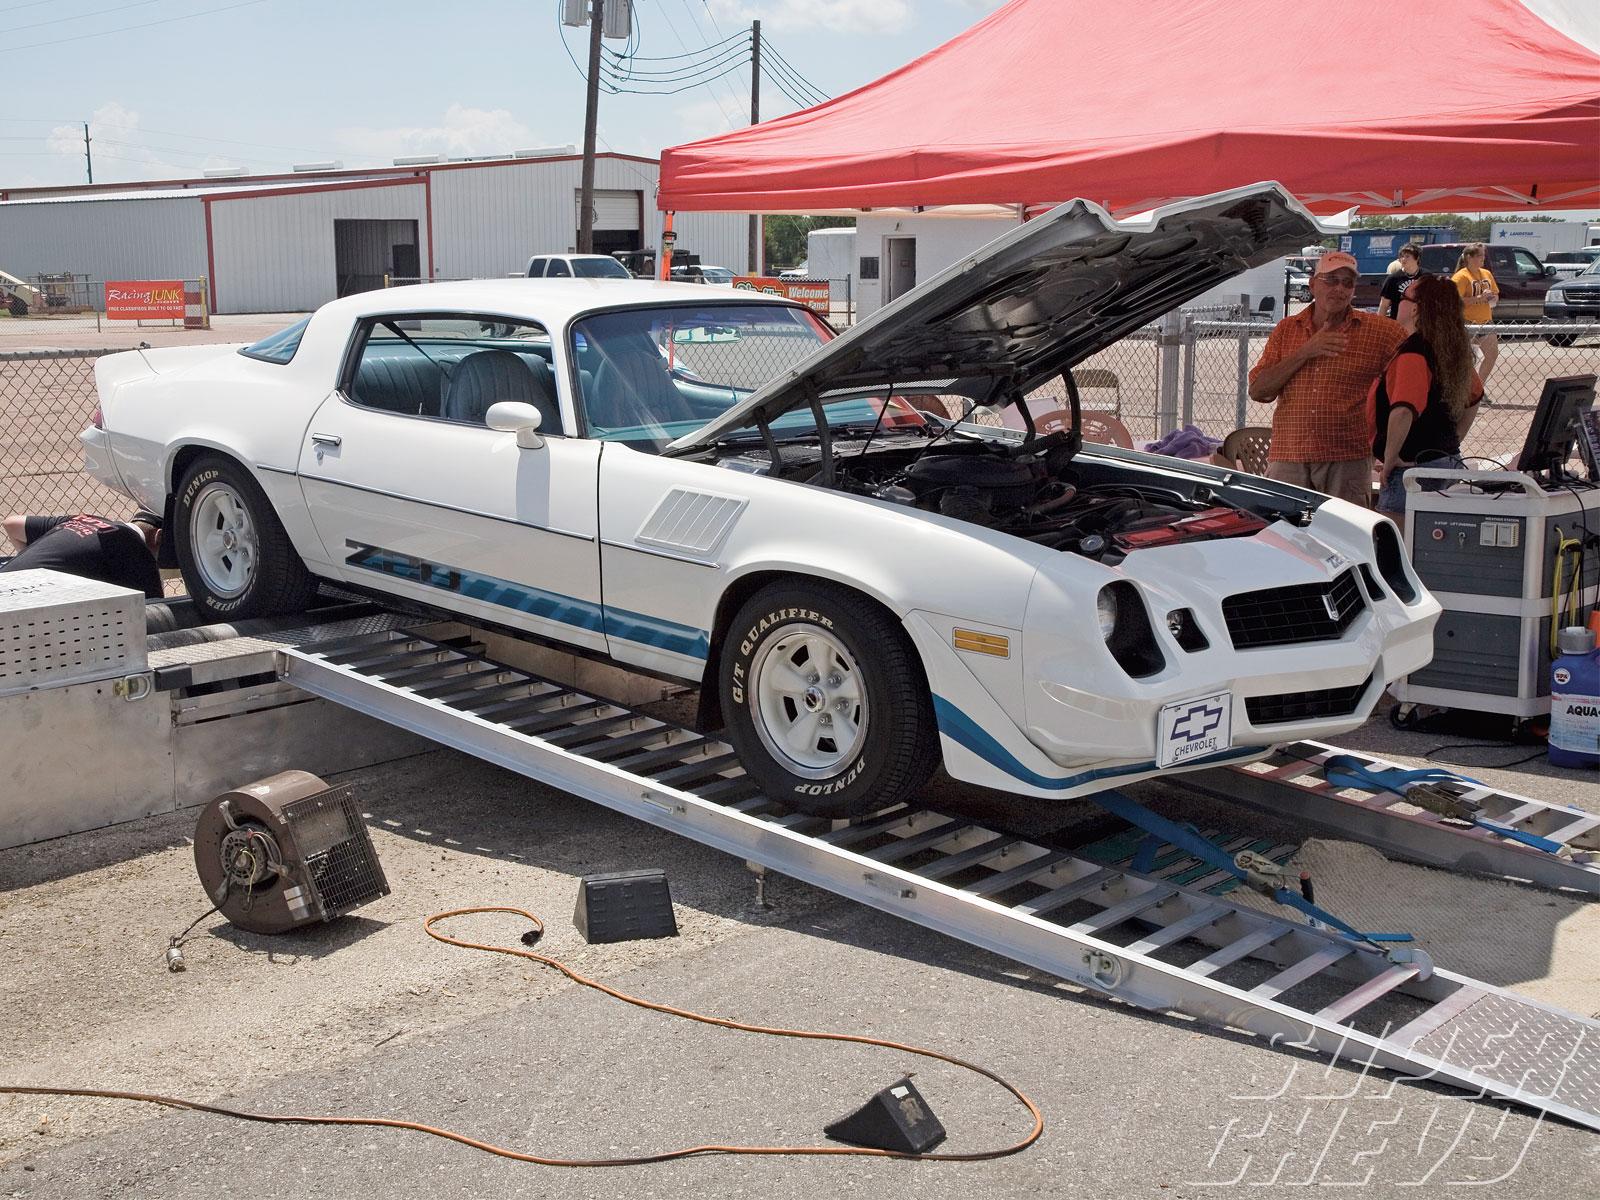 1979 Chevrolet Camaro Chevrolet Camaro 1979 Z28 Auto Design Tech 1600x1200